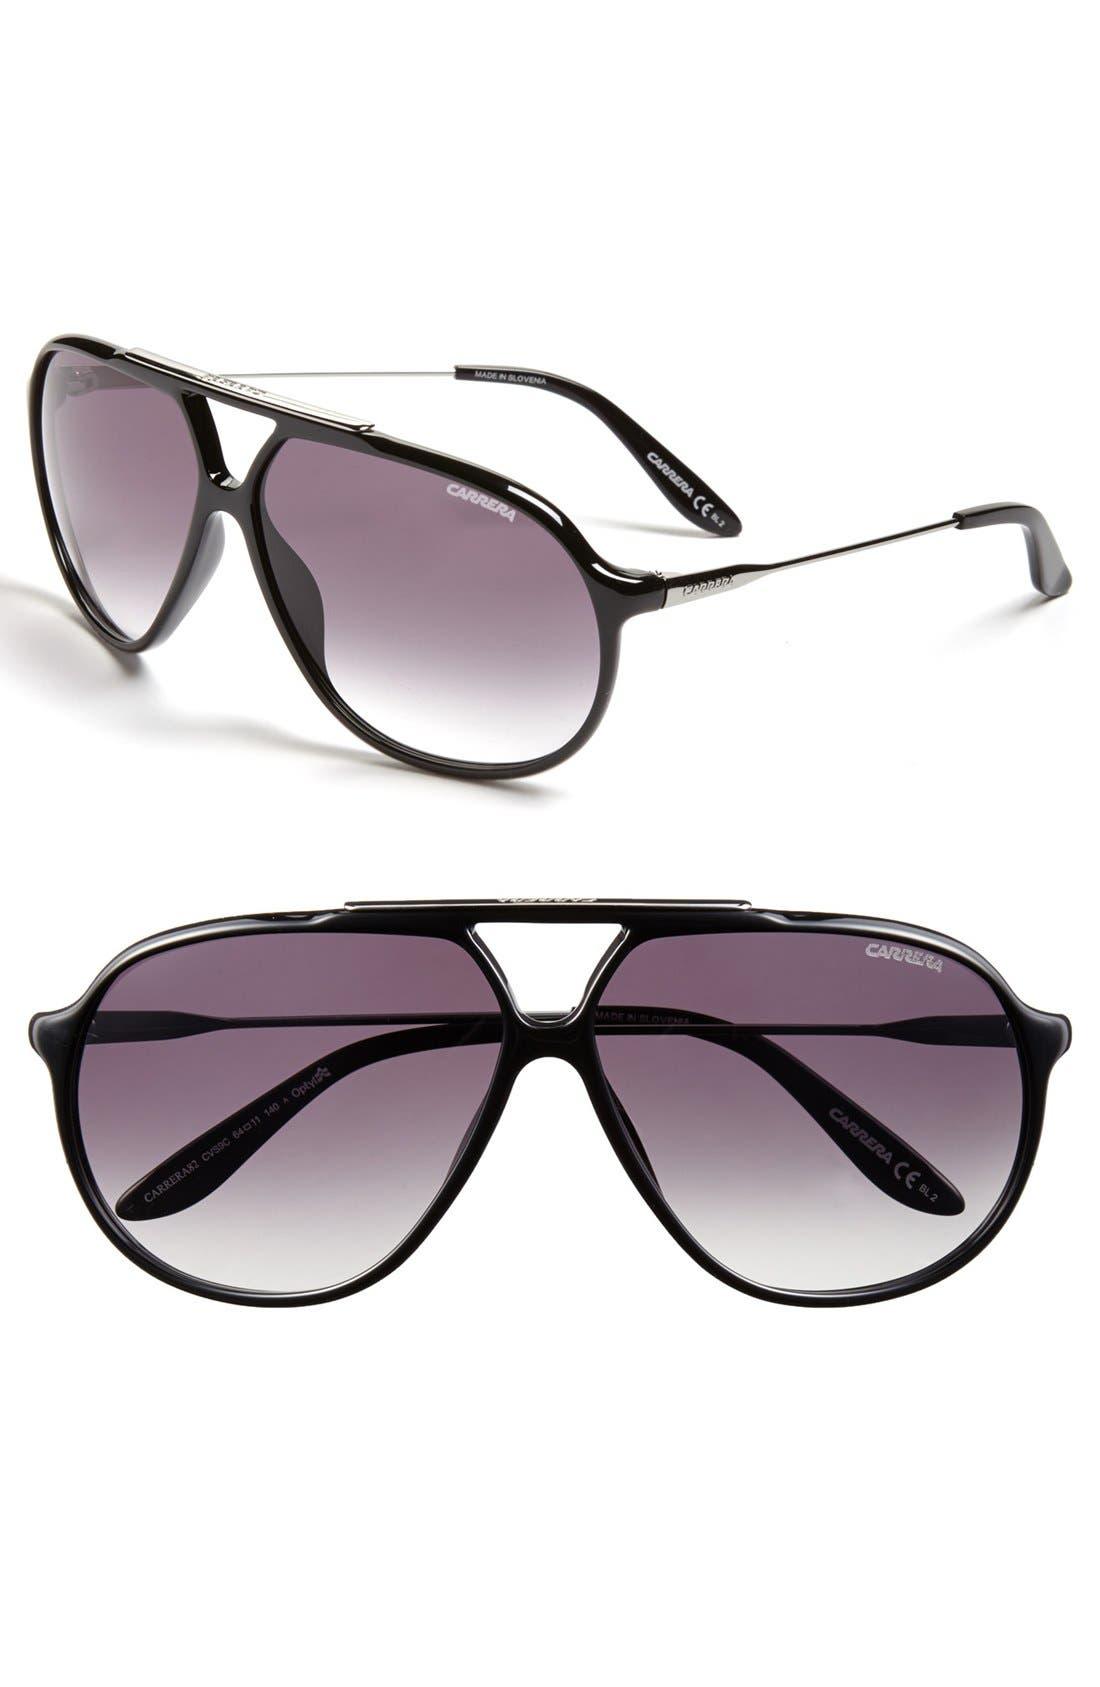 Main Image - Carrera Eyewear 64mm Aviator Sunglasses